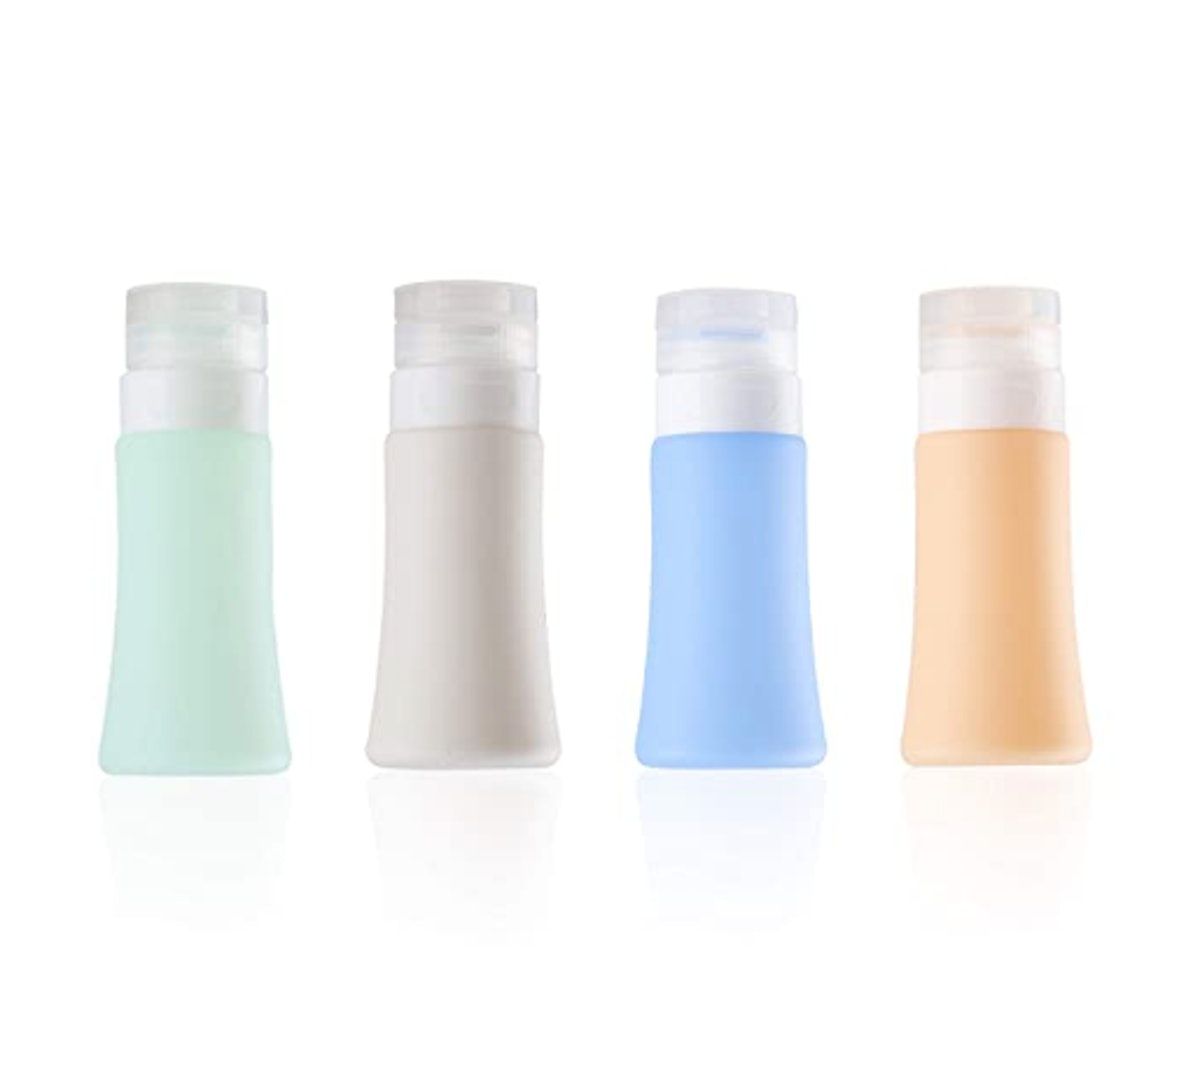 YAMYONE Travel Bottles Tsa Approved